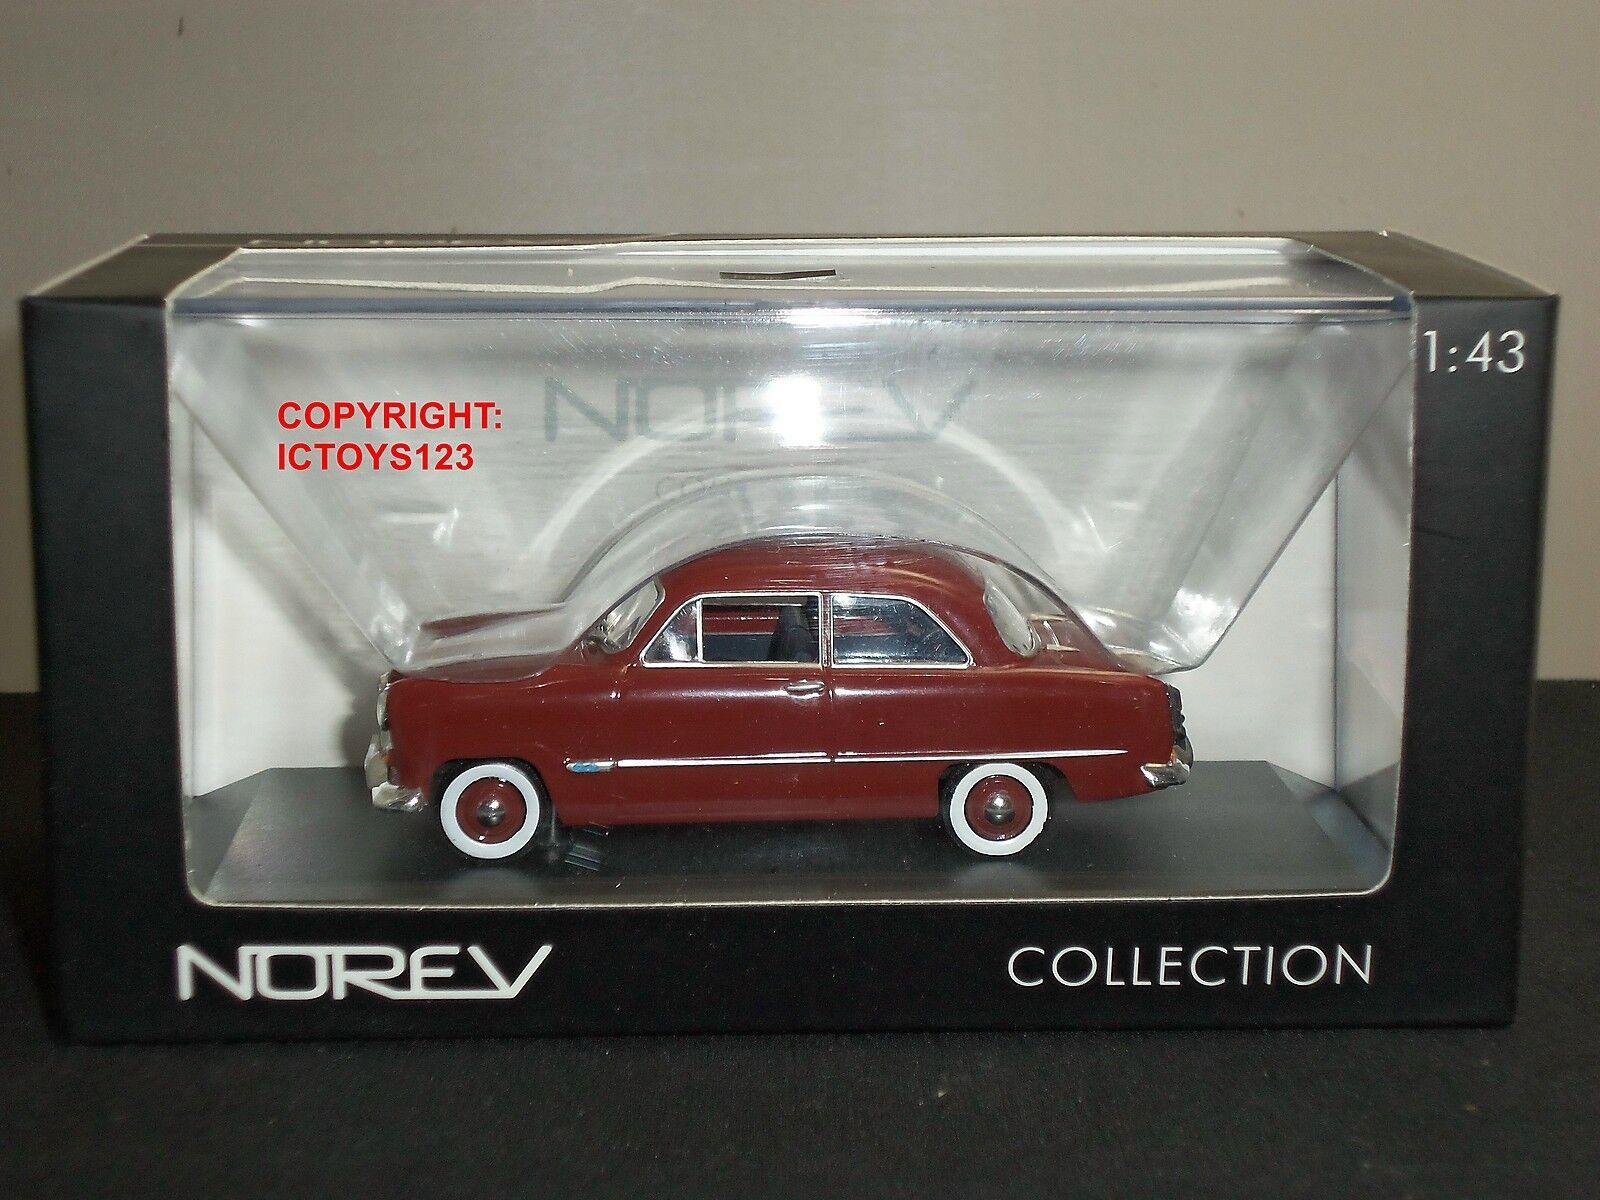 Norev Norev Norev 270533 Ford Taunus 12M Marrón Diecast Modelo Coche Clásico 8375f5